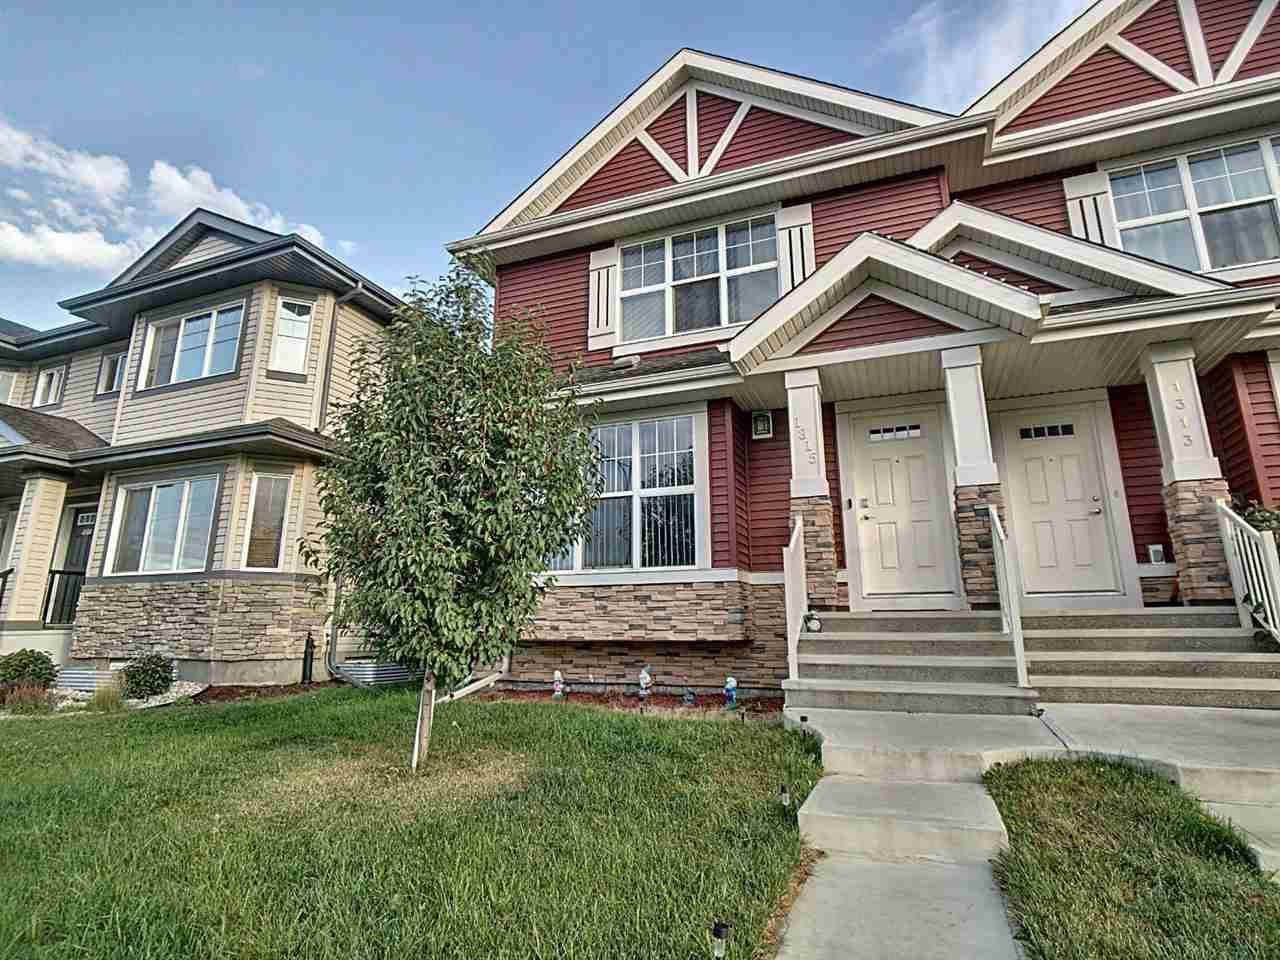 Townhouse for sale at 1315 Watt Dr Sw Edmonton Alberta - MLS: E4194738